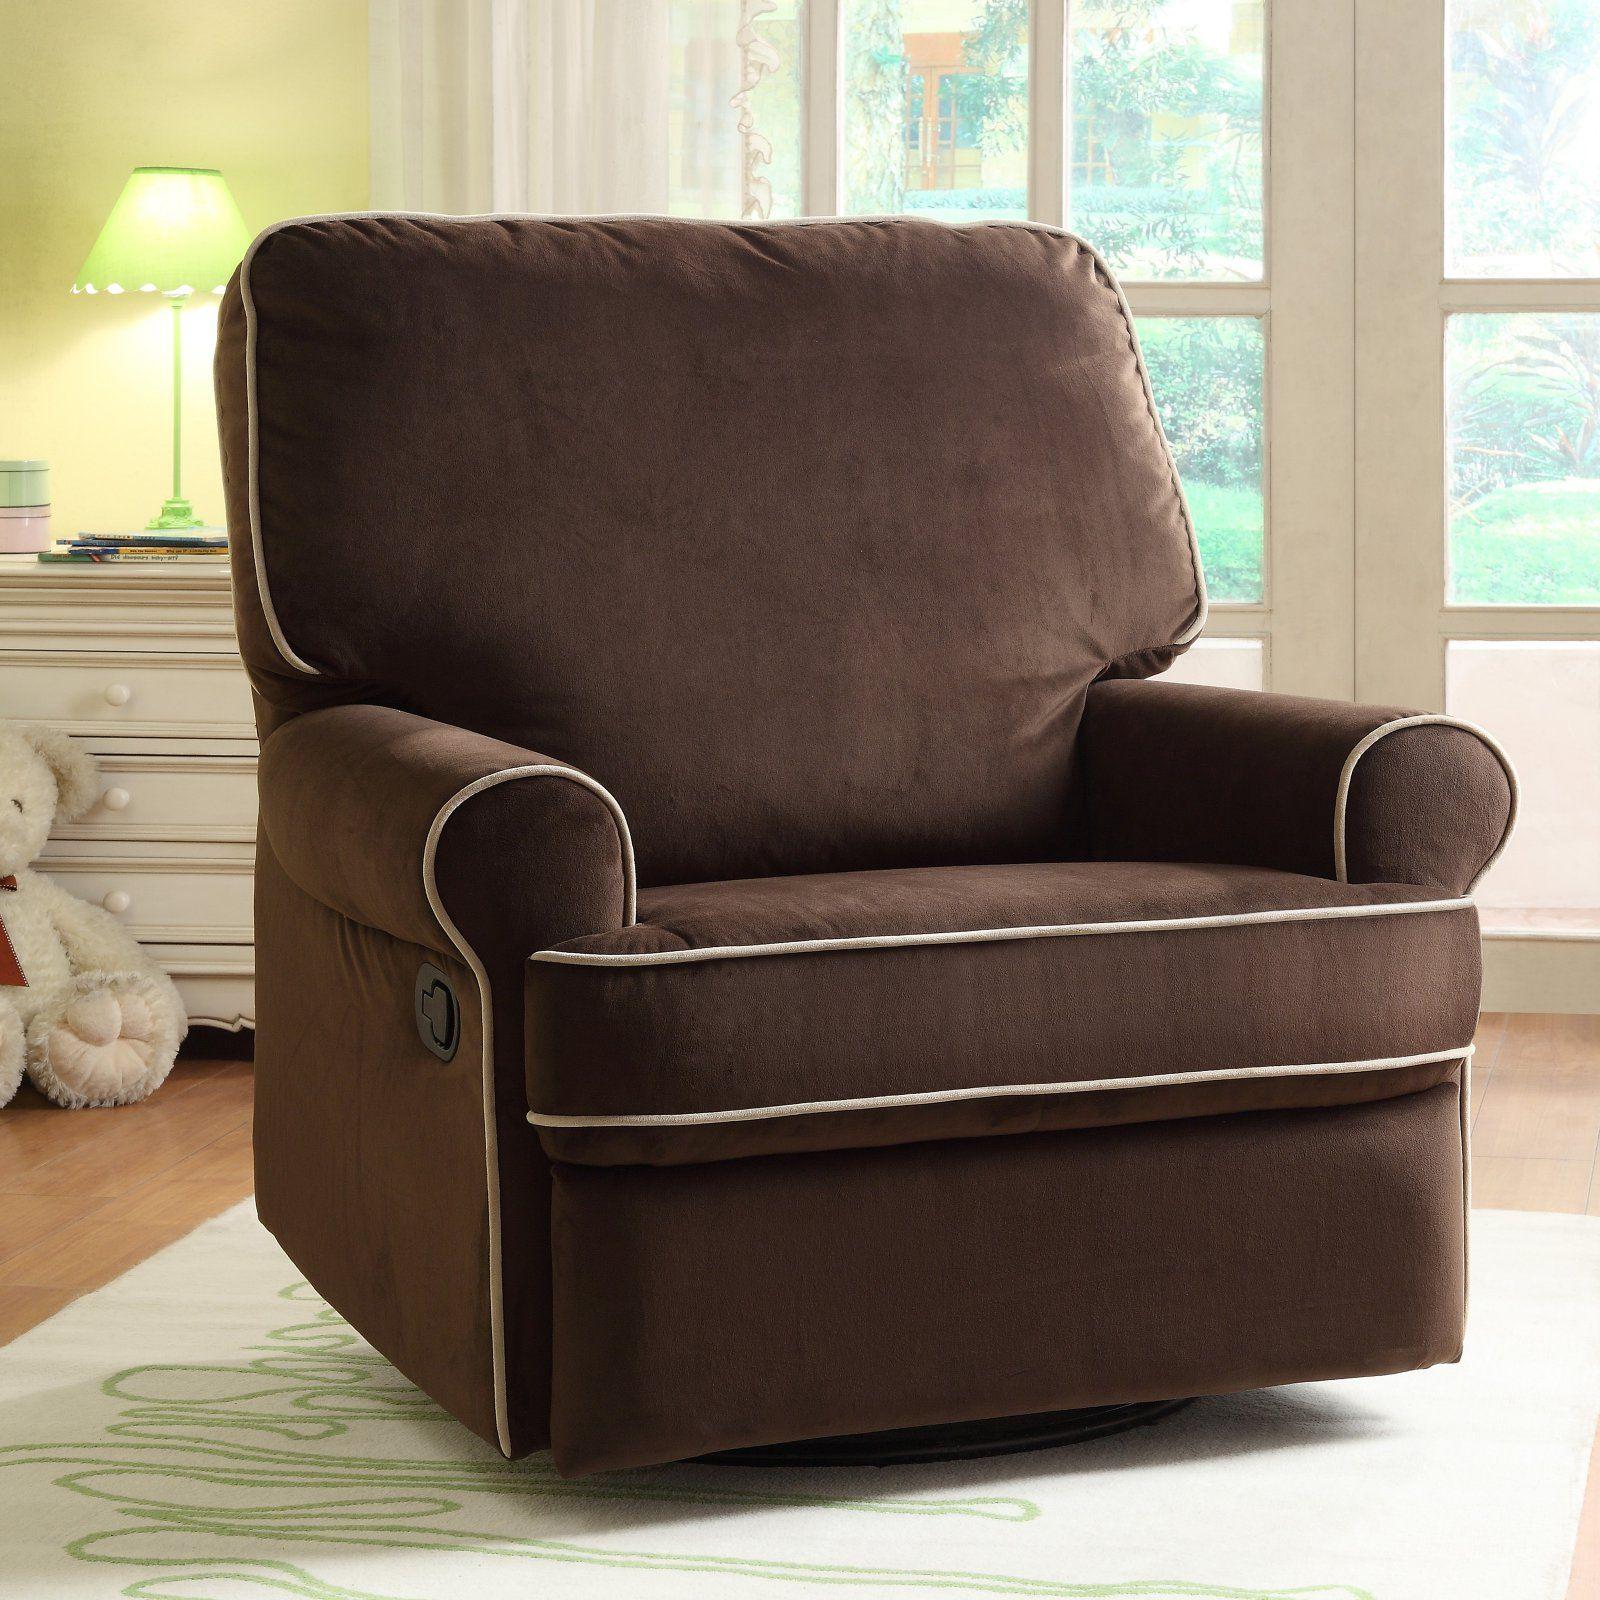 Outstanding Viv Rae Kimberley Swivel Glider Ottoman Reviews Andrewgaddart Wooden Chair Designs For Living Room Andrewgaddartcom